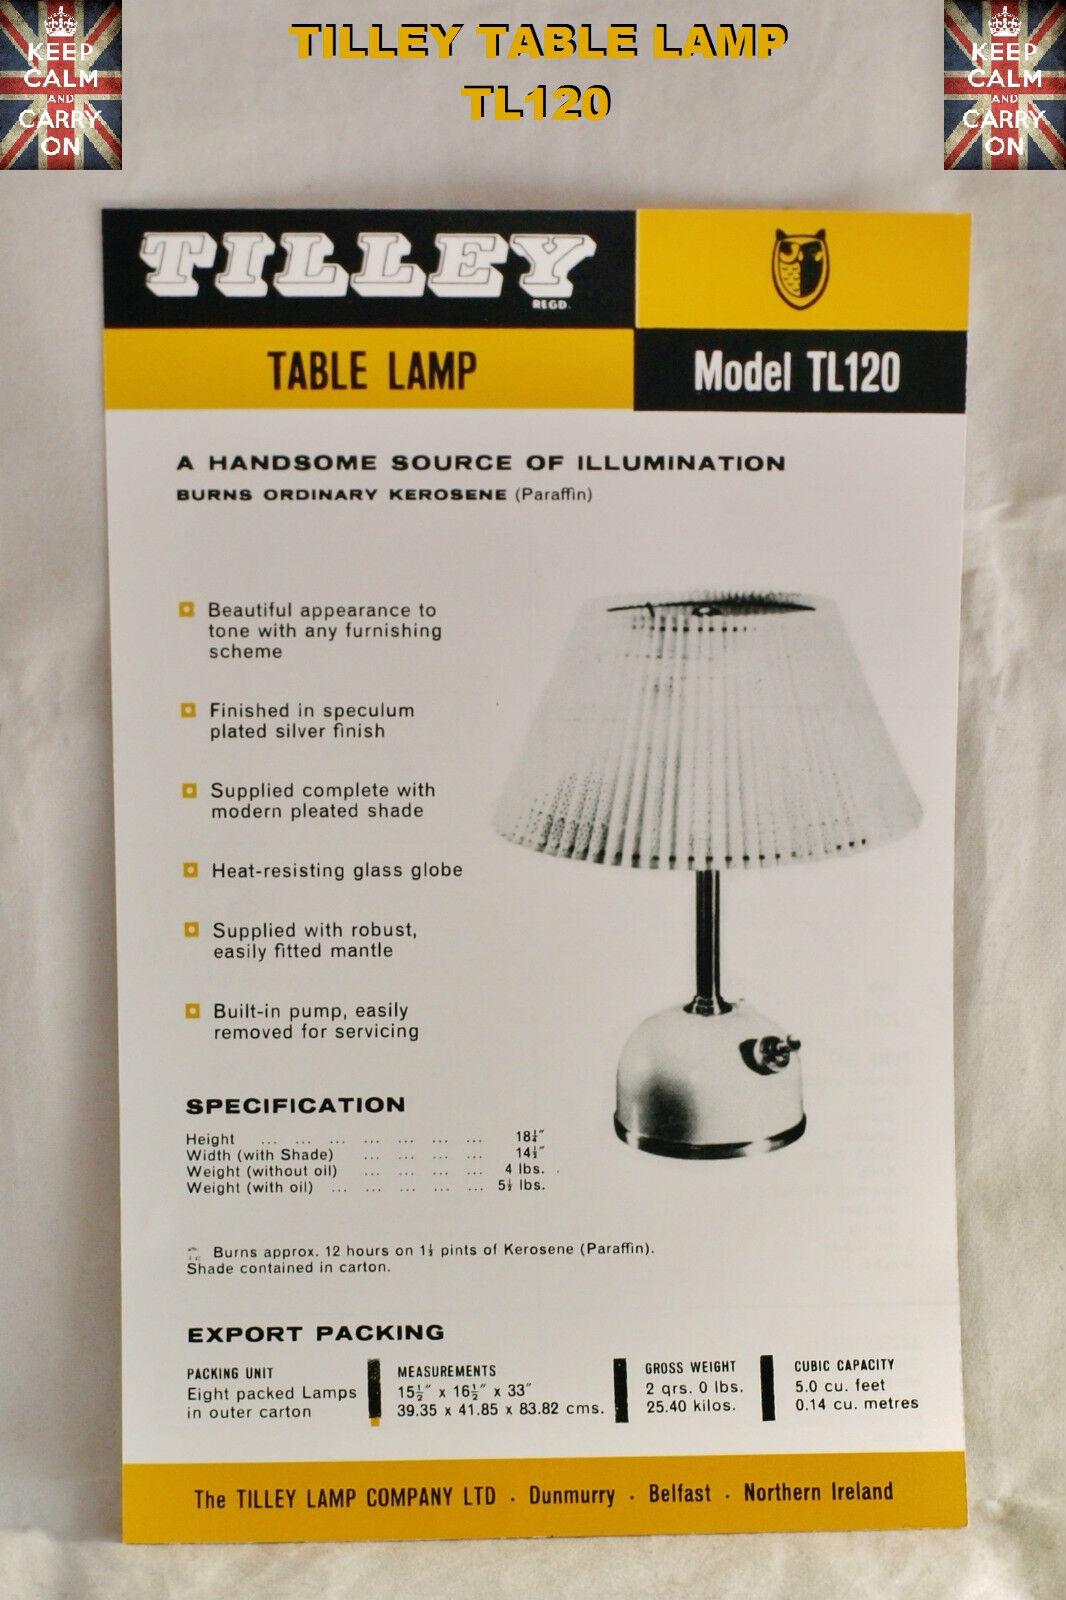 Tilley Lampe R55 Radiateur instructions CARTE NOTICE Tilley instructions